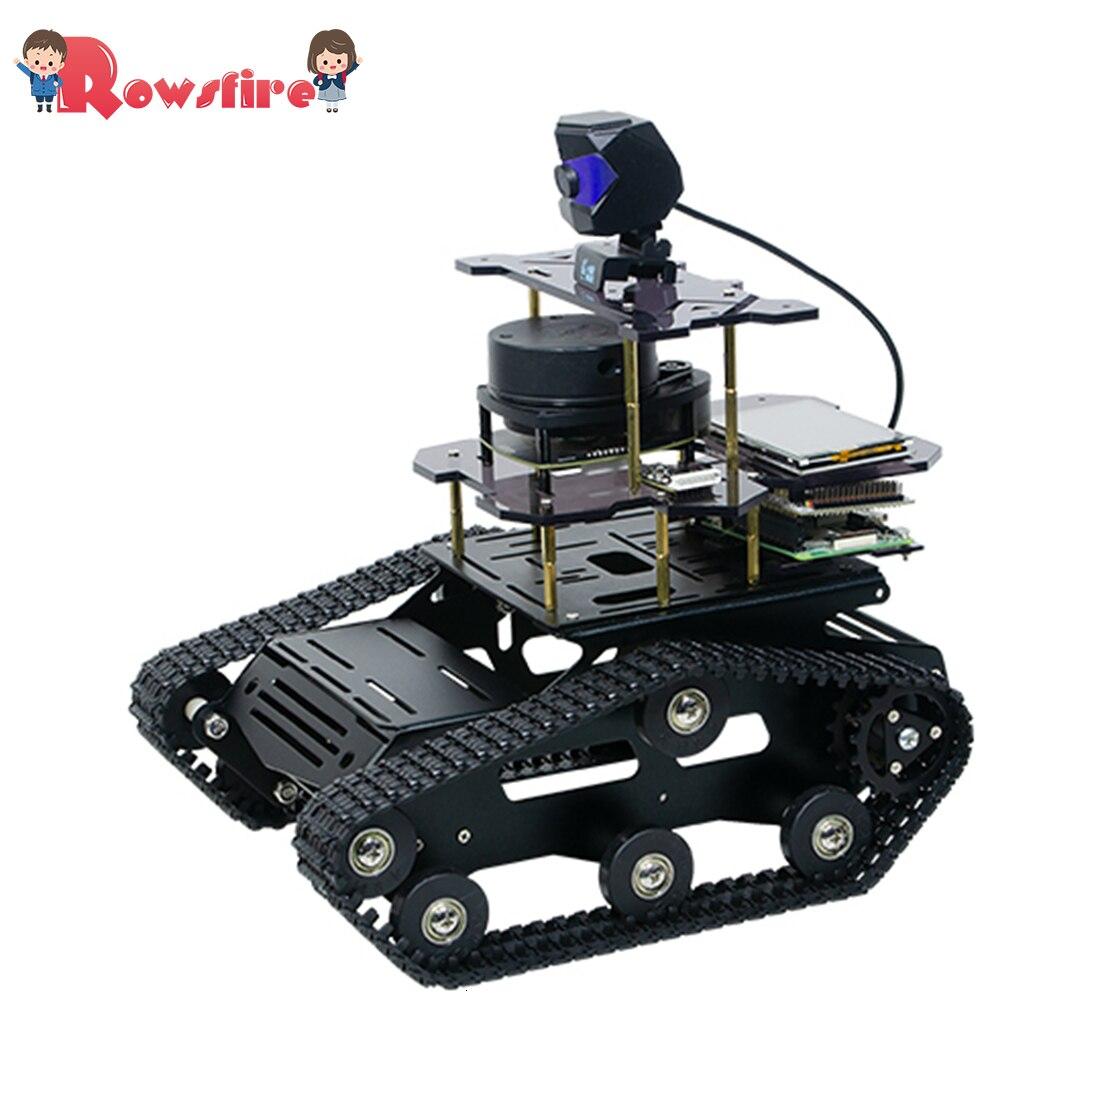 DIY Smart Robot Tank Chassis Car with Laser Radar for Raspberry Pi 4 (2G) - Black